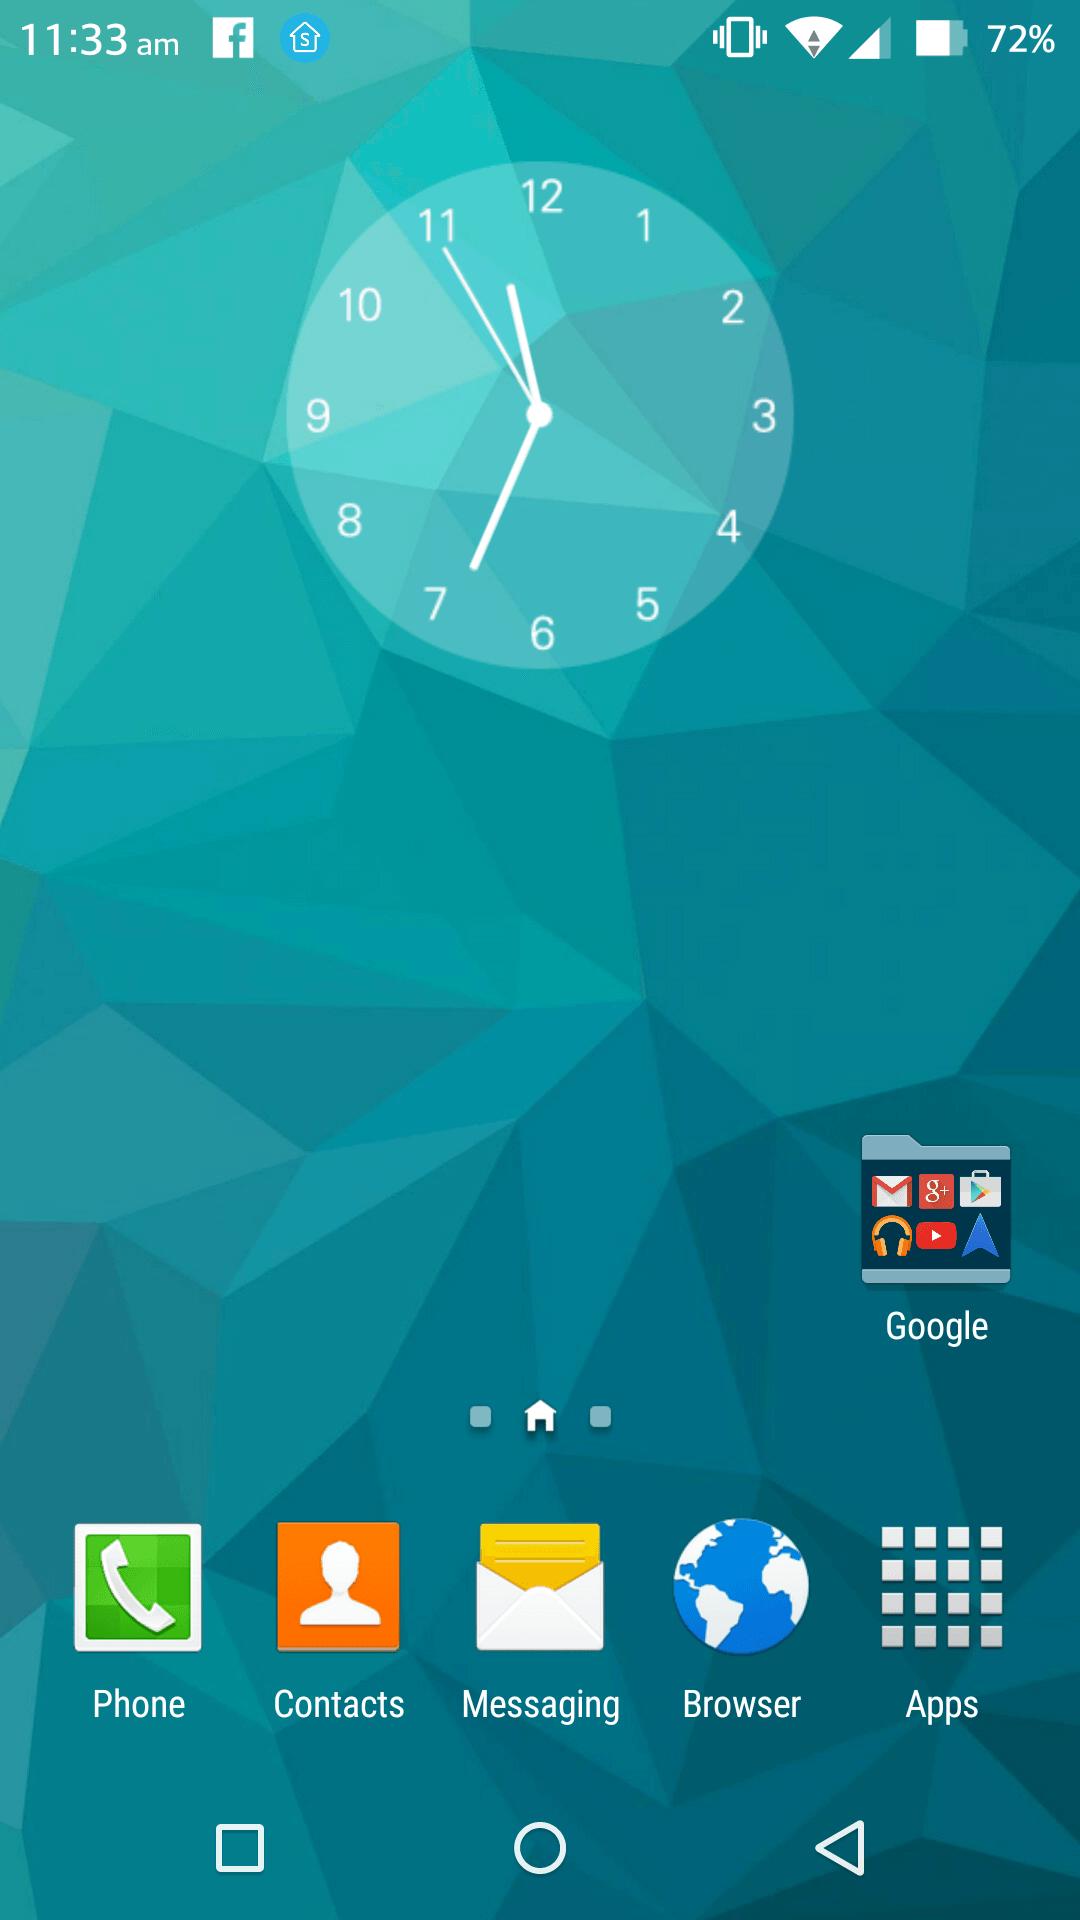 Screenshot 2015 04 30 11 33 56 دانلود نرم افزار لانچر به سبک گلکسی اس6  S Launcher Prime (Galaxy S6 Launcher) v3.6 اندروید